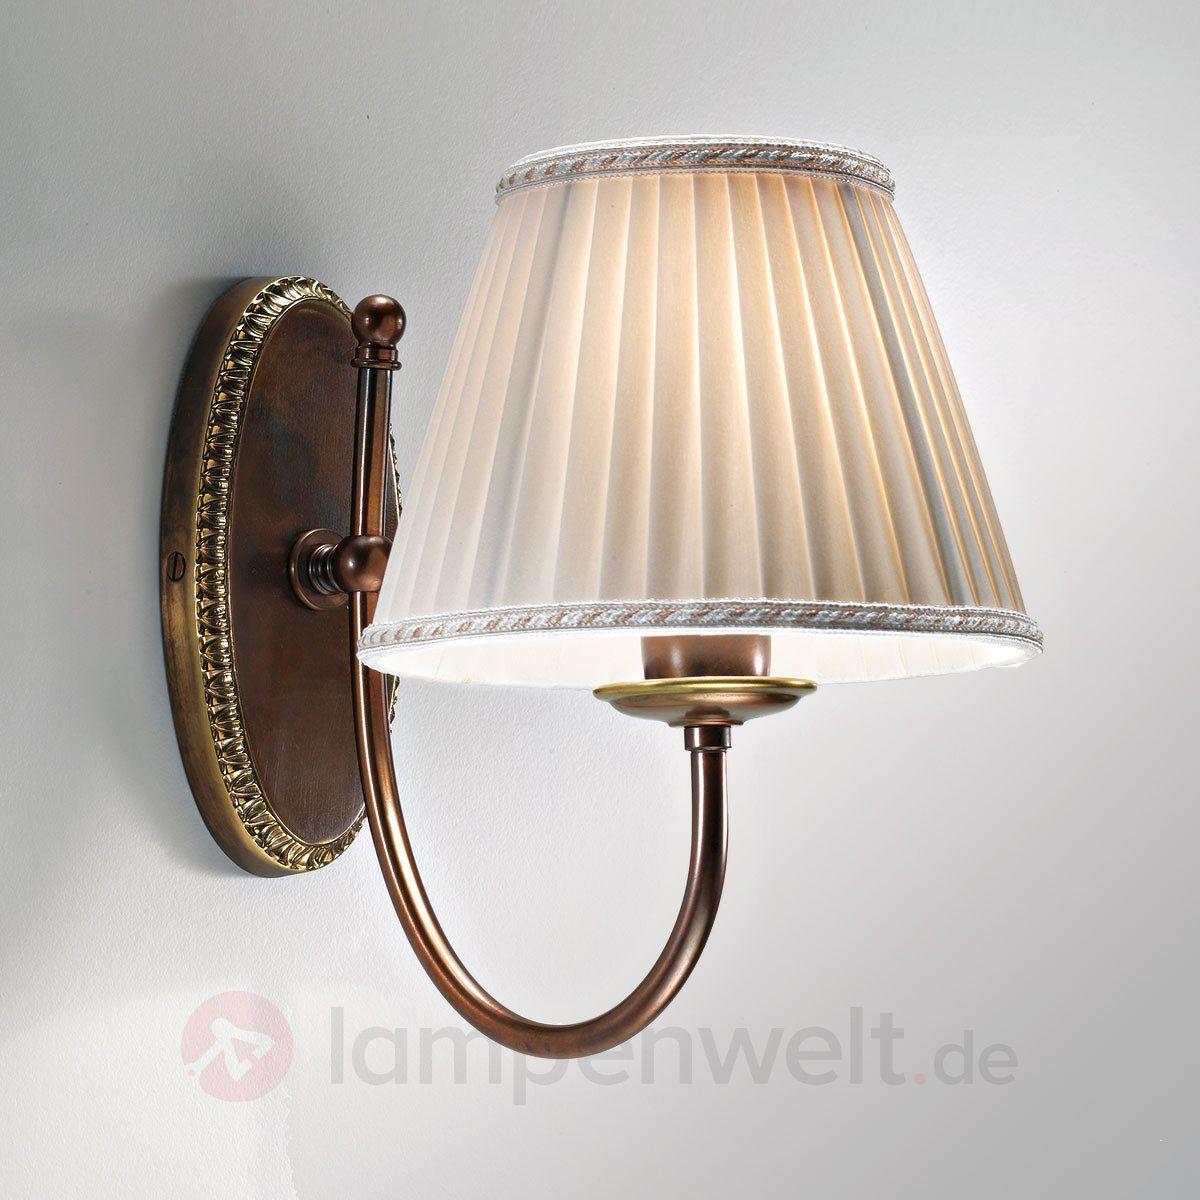 Wandlampen Mit Schalter Ikea